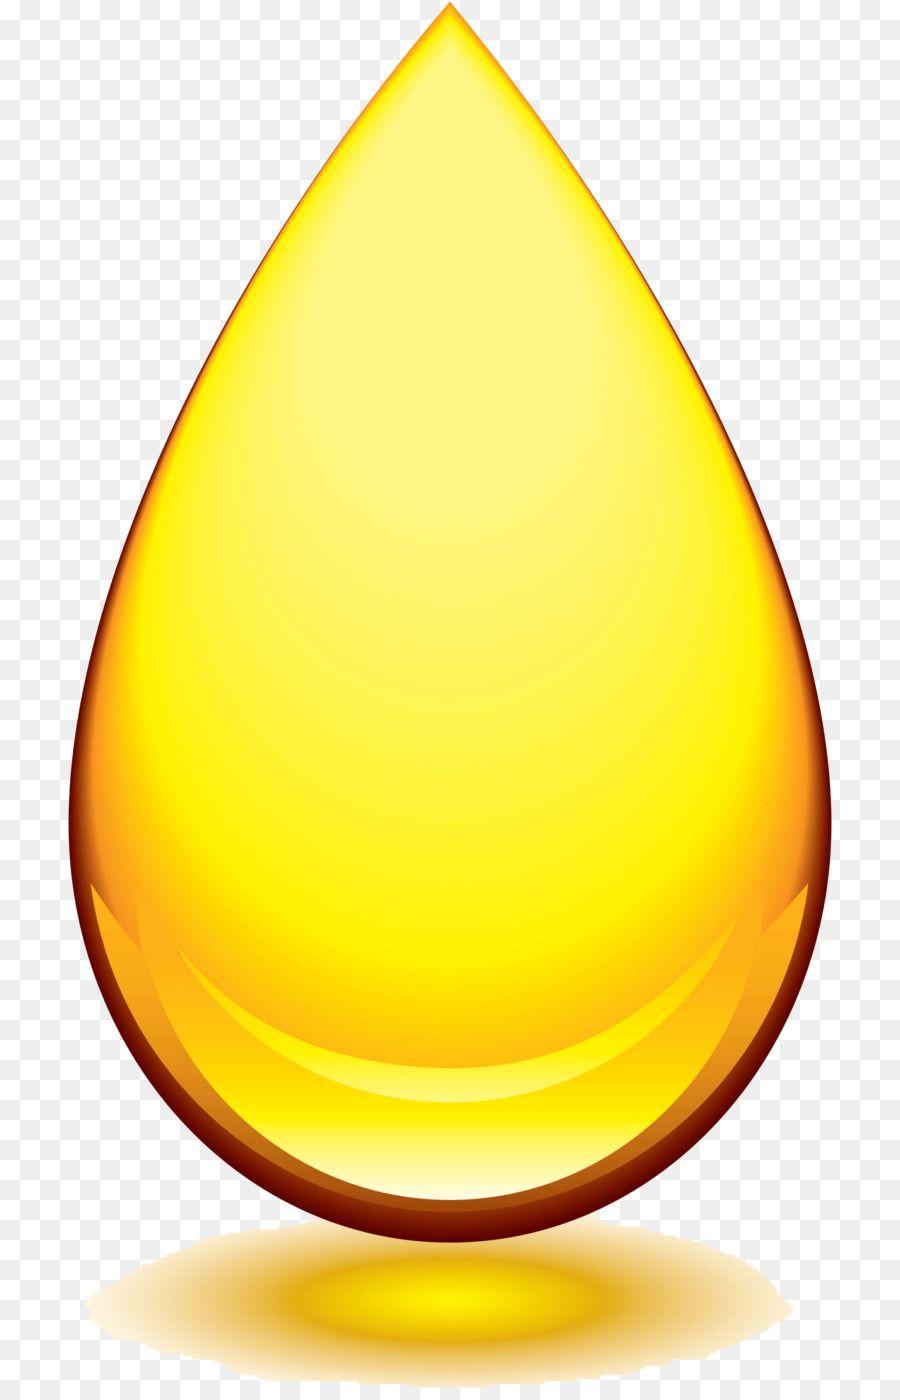 Liquid Oil Drop Unlimited Download Kisspng Com Wine Bottle Design Oils Milk Splash